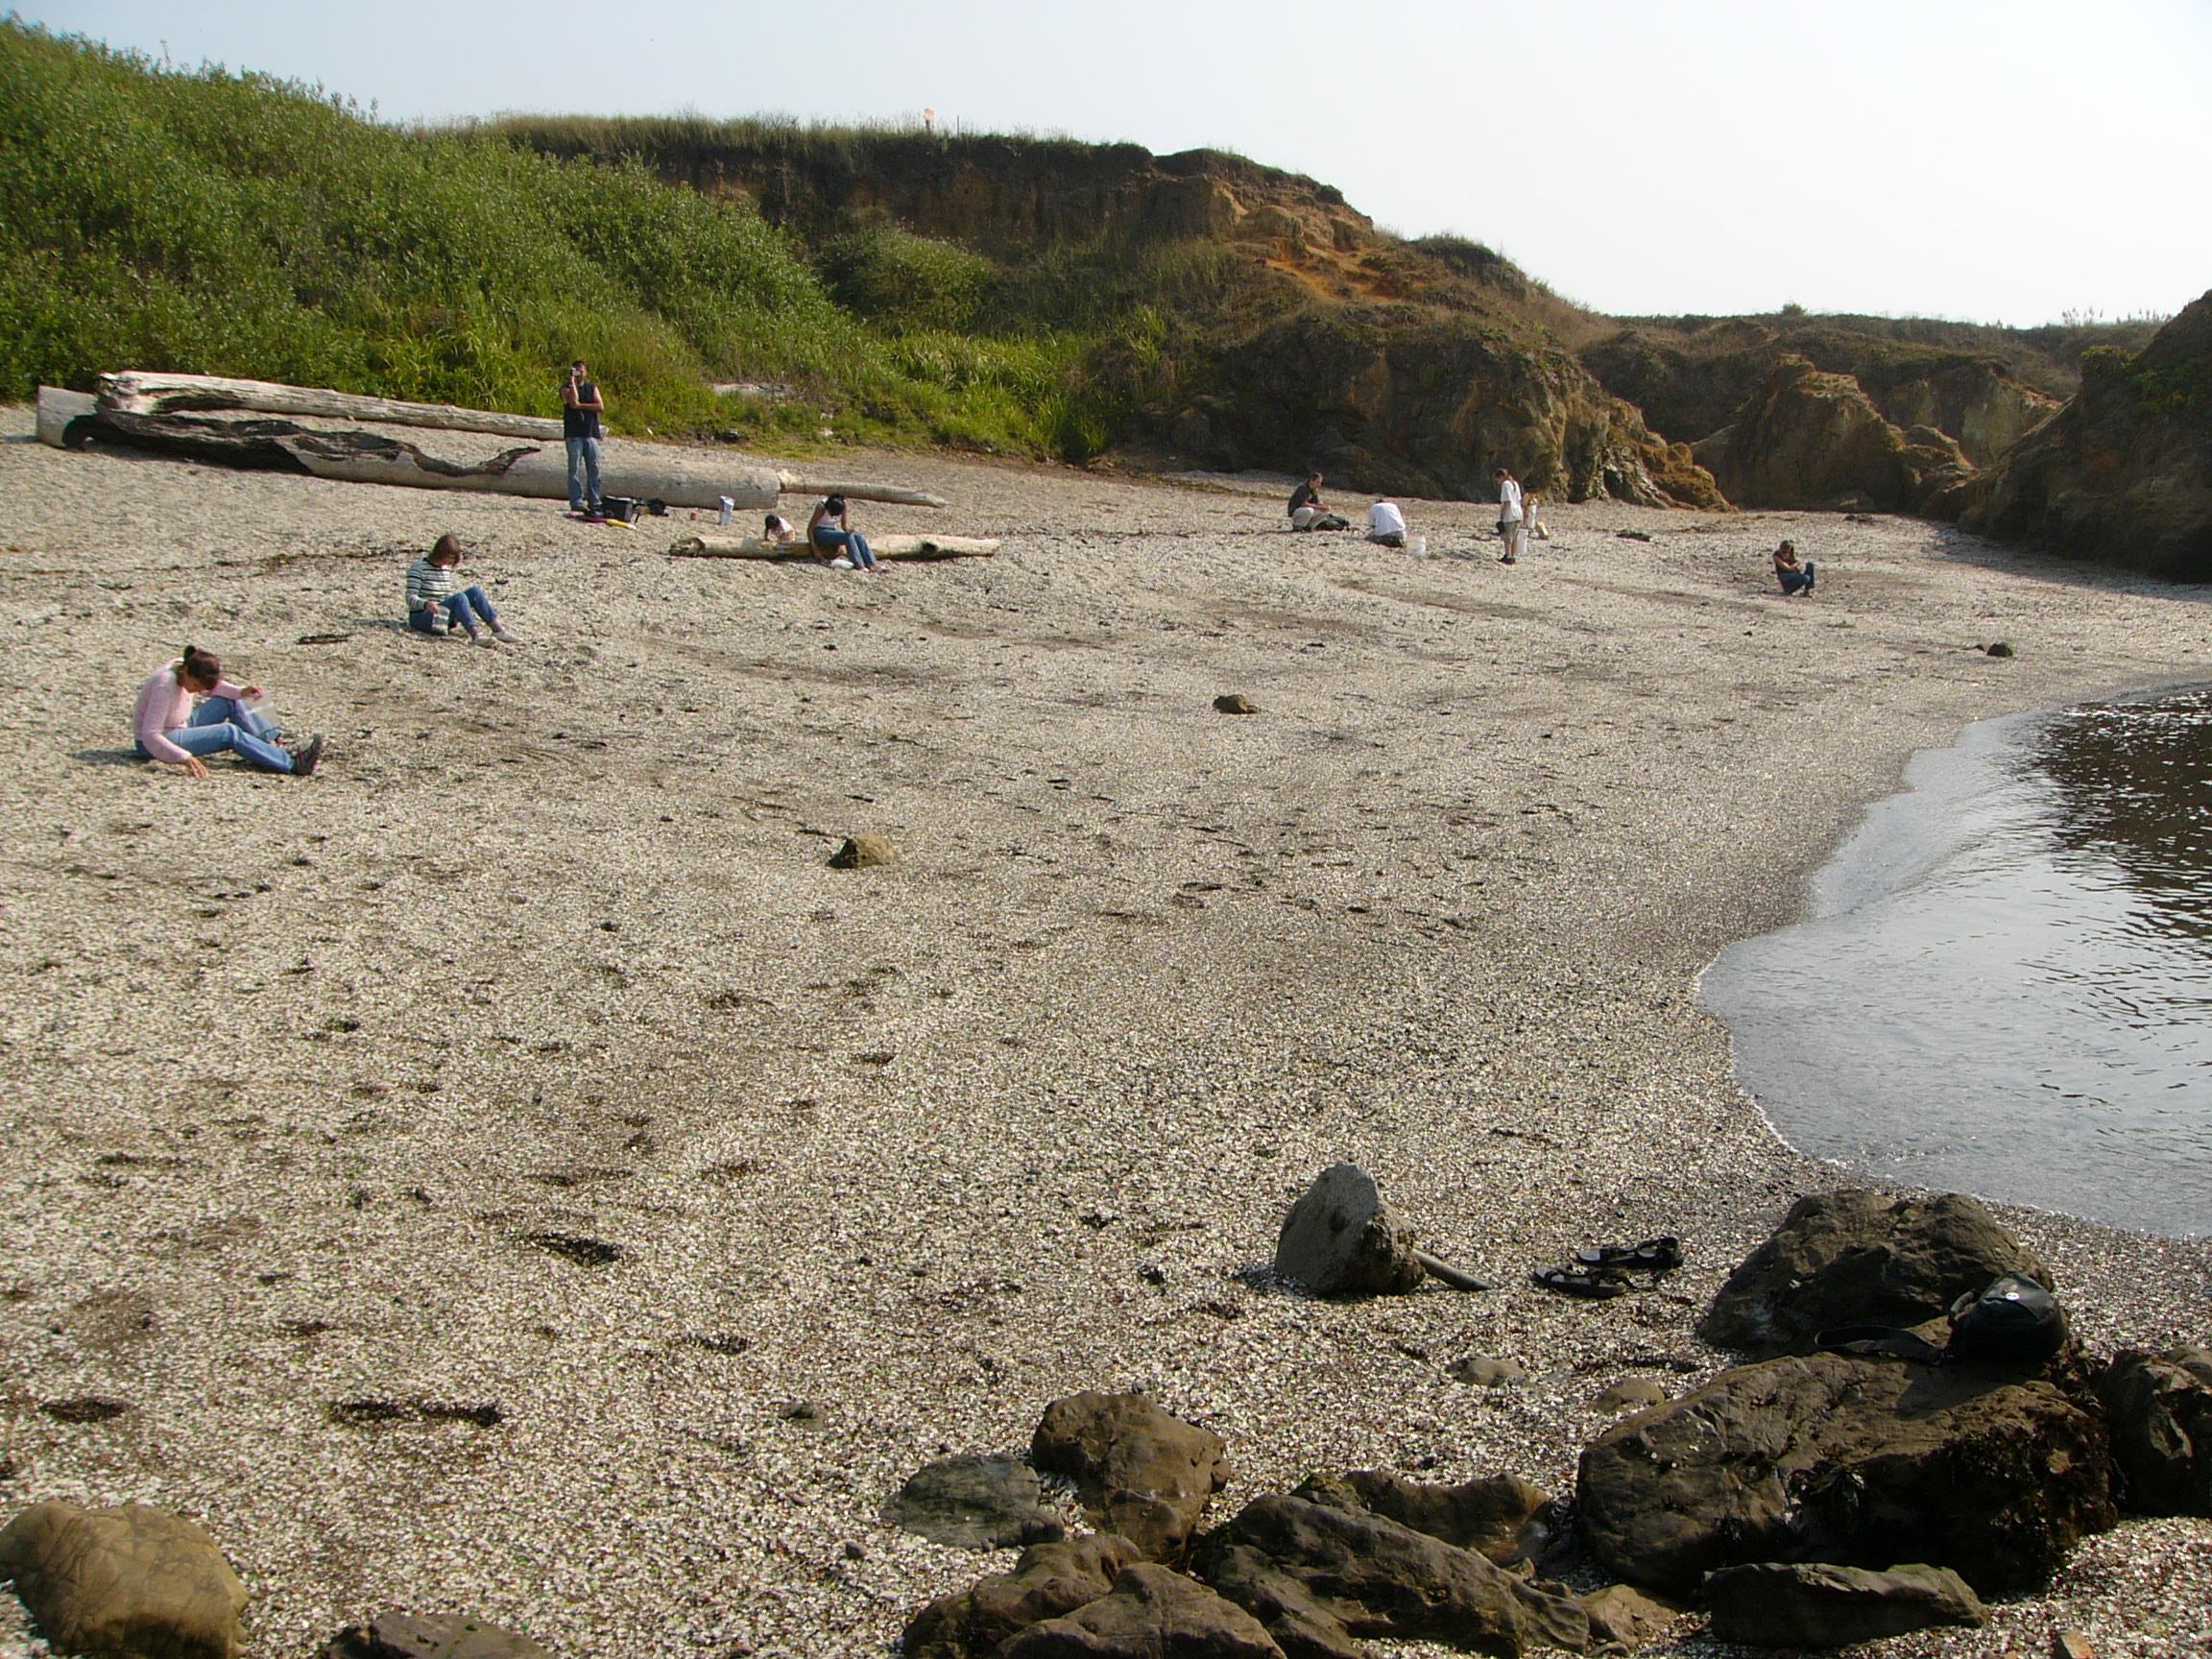 Sklenená pláž Fort Bragg, Kalifornia